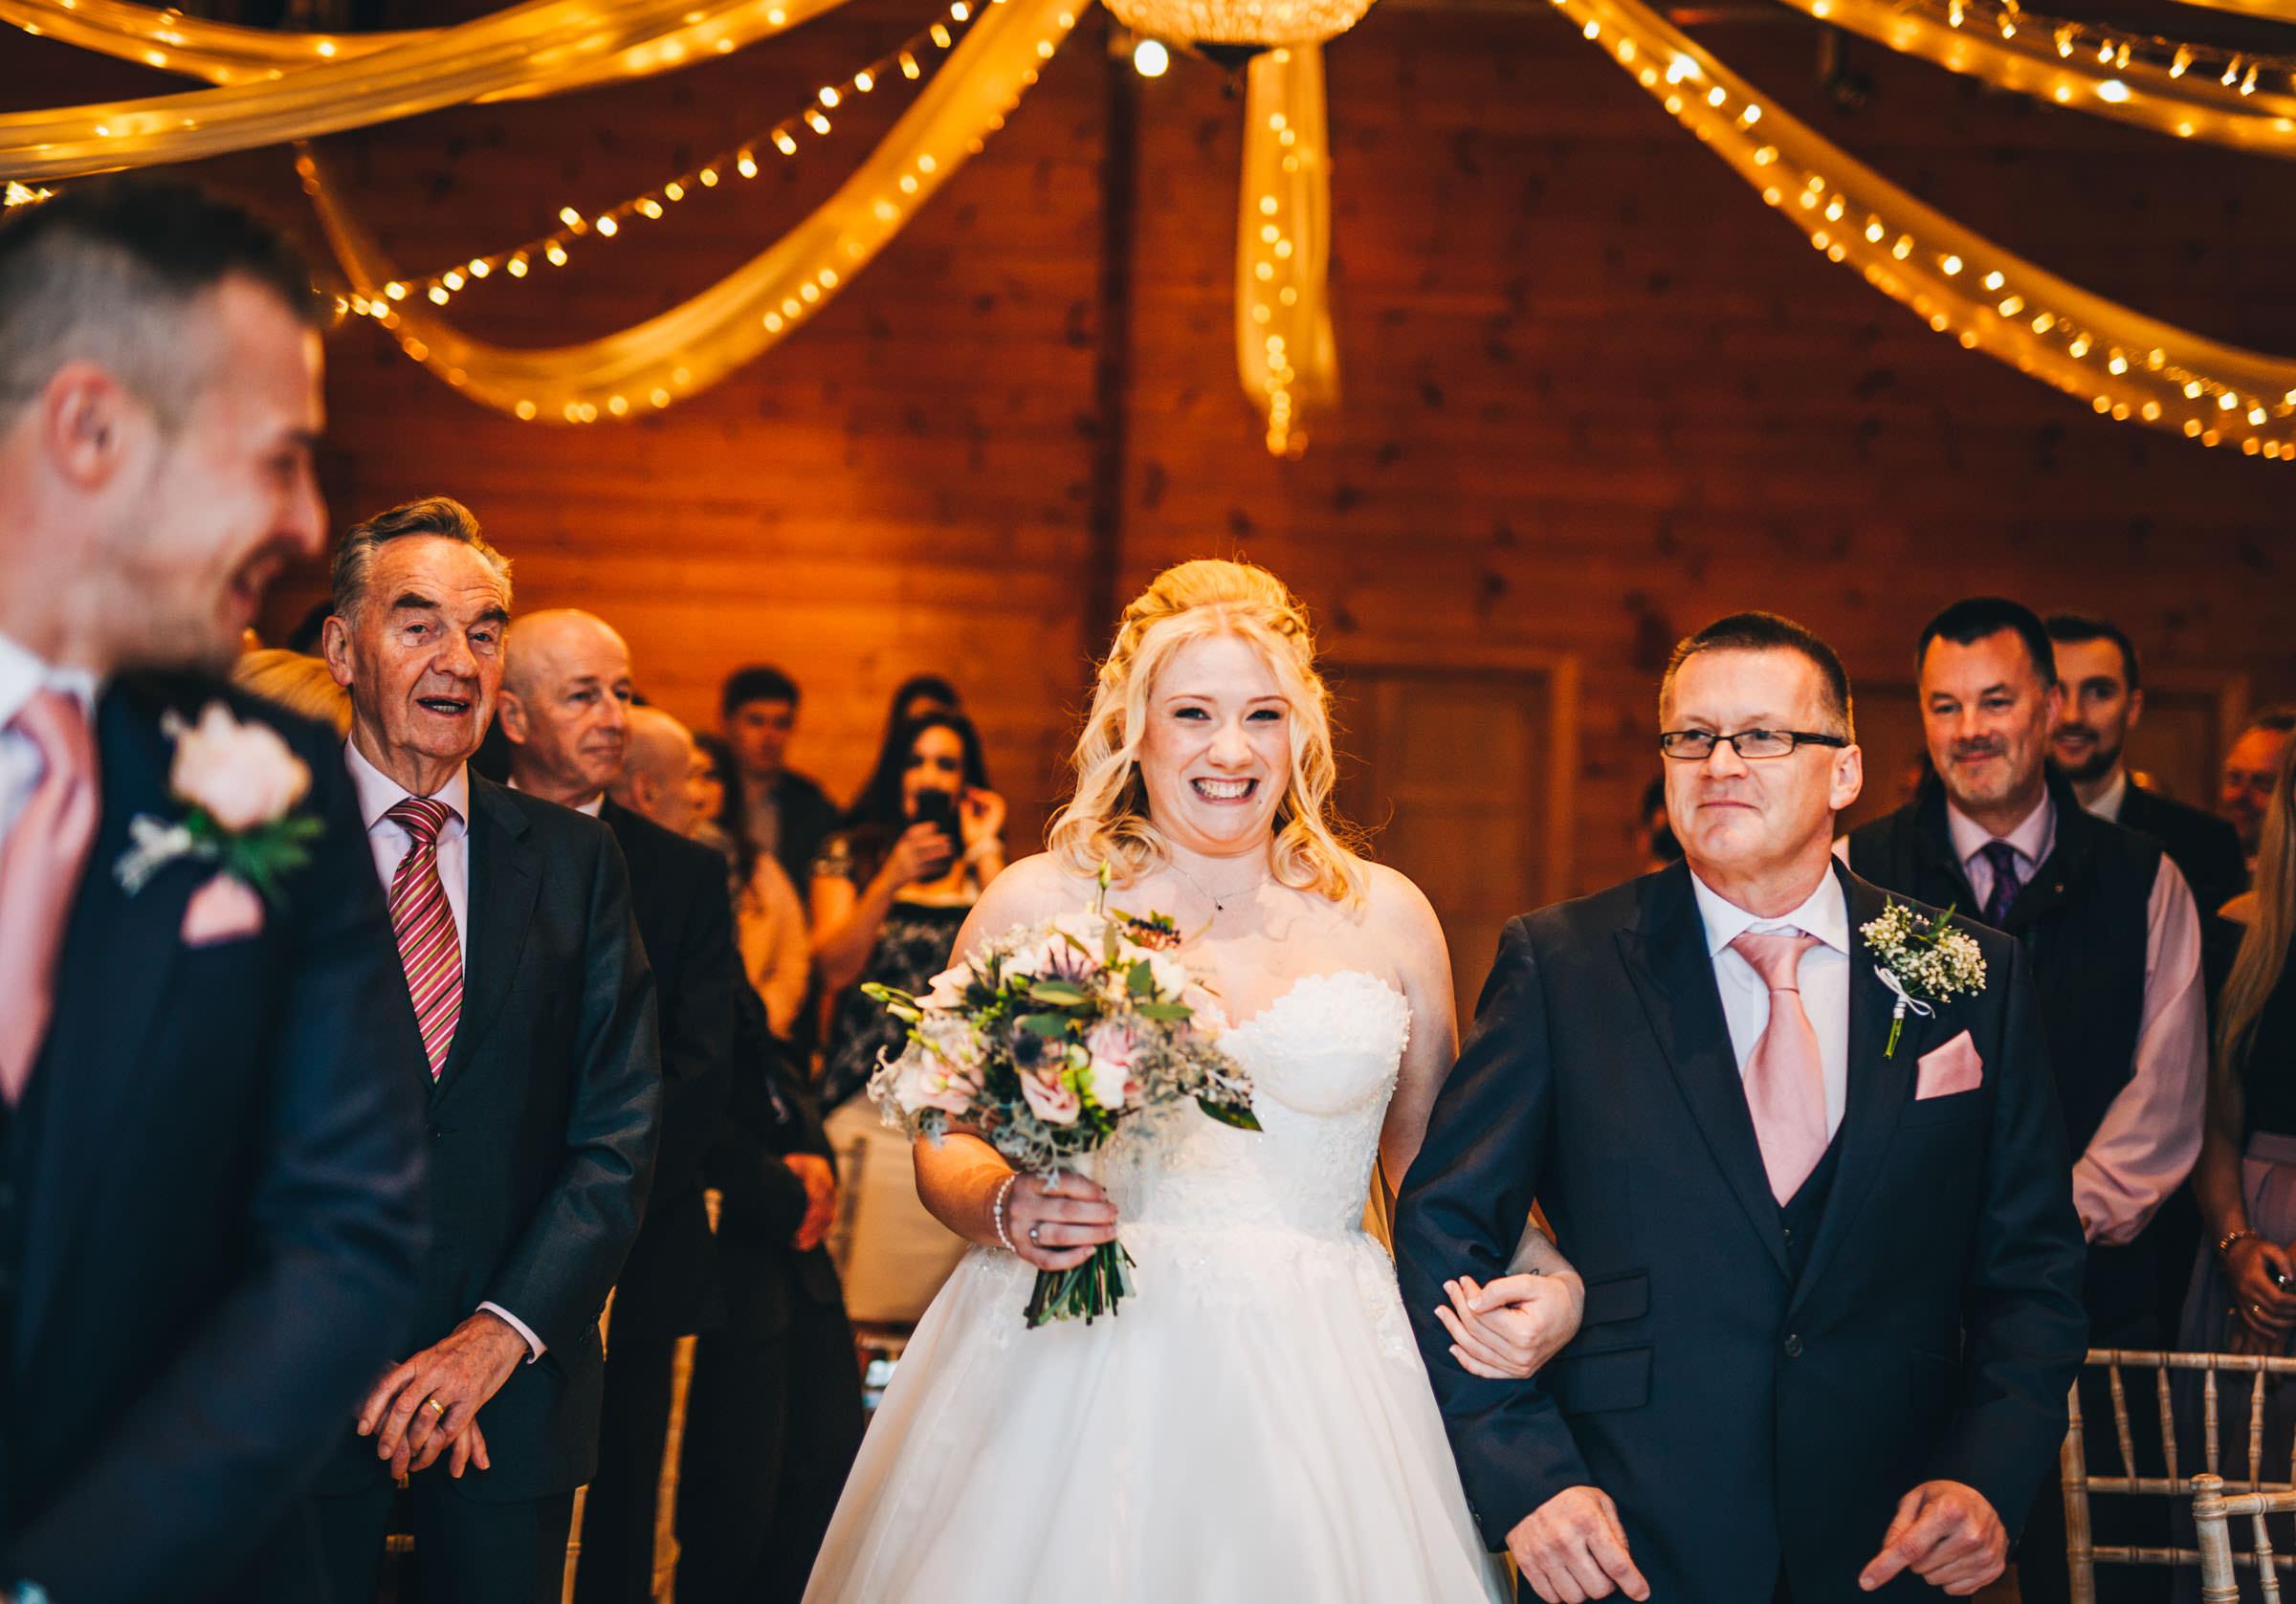 bride walks down the aisle - cheshire wedding photographer